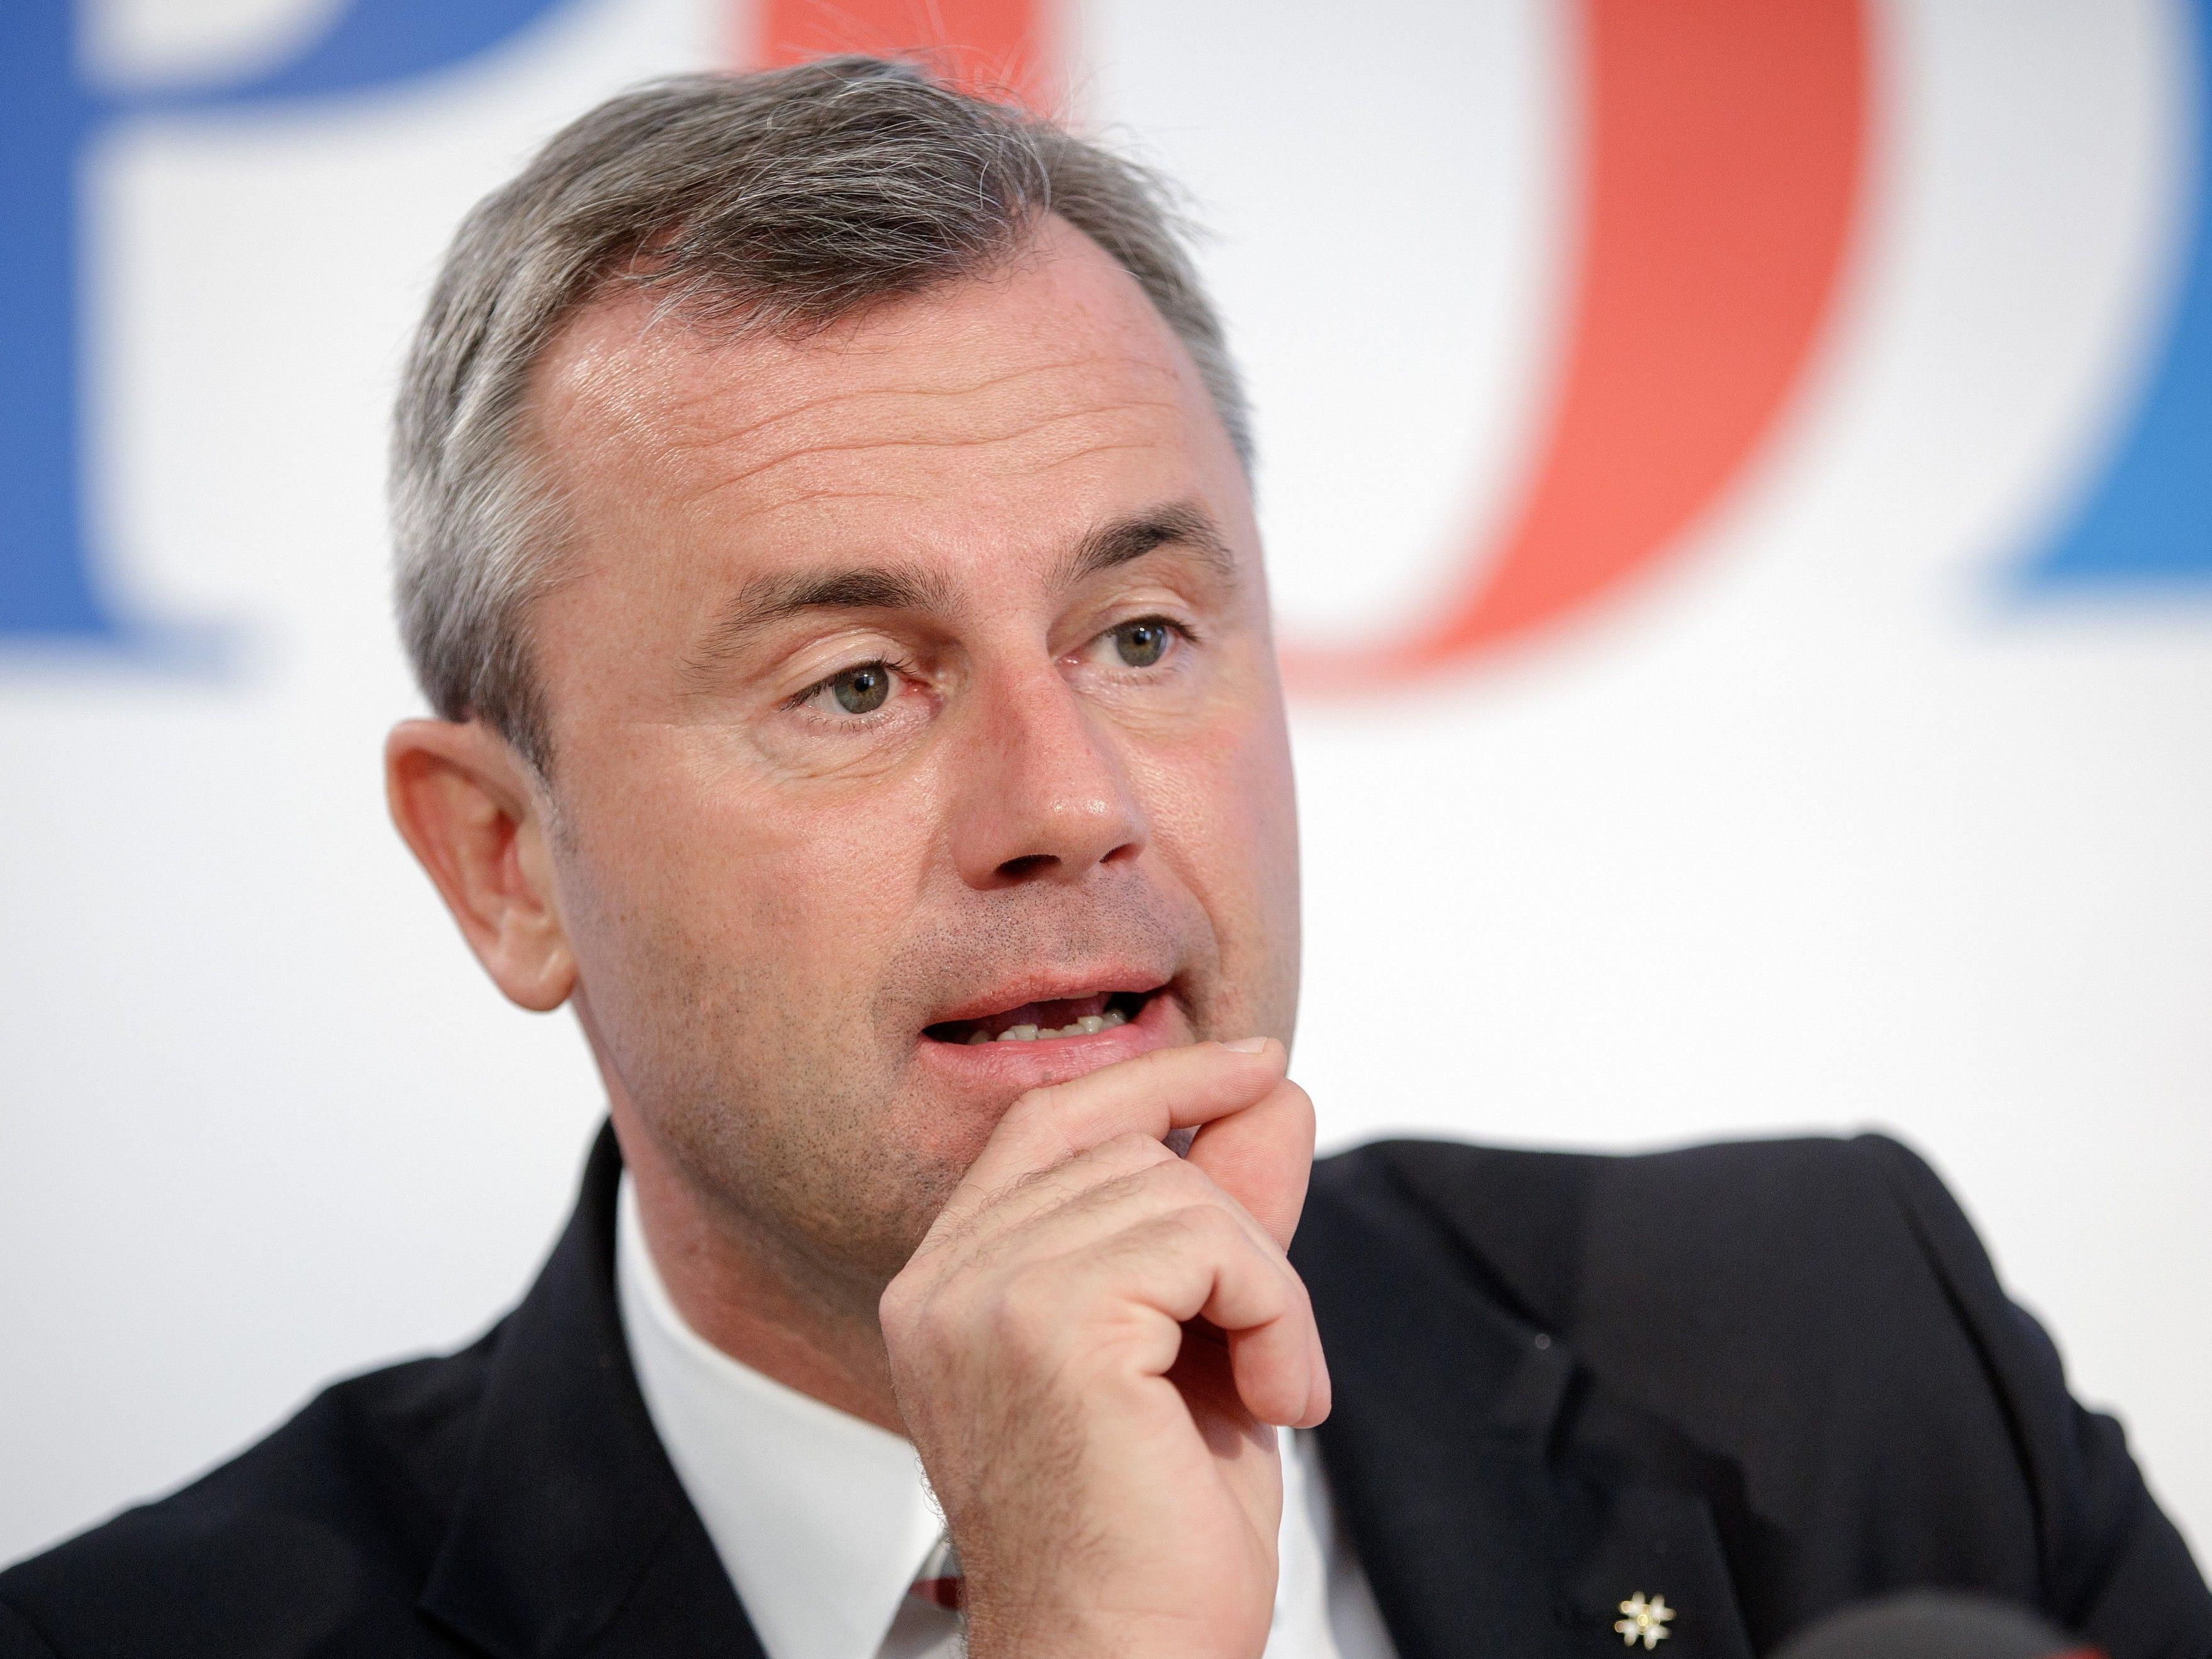 Norbert Hofer (FPÖ) äußerte im APA-Sommerinterview aktuelle Ideen